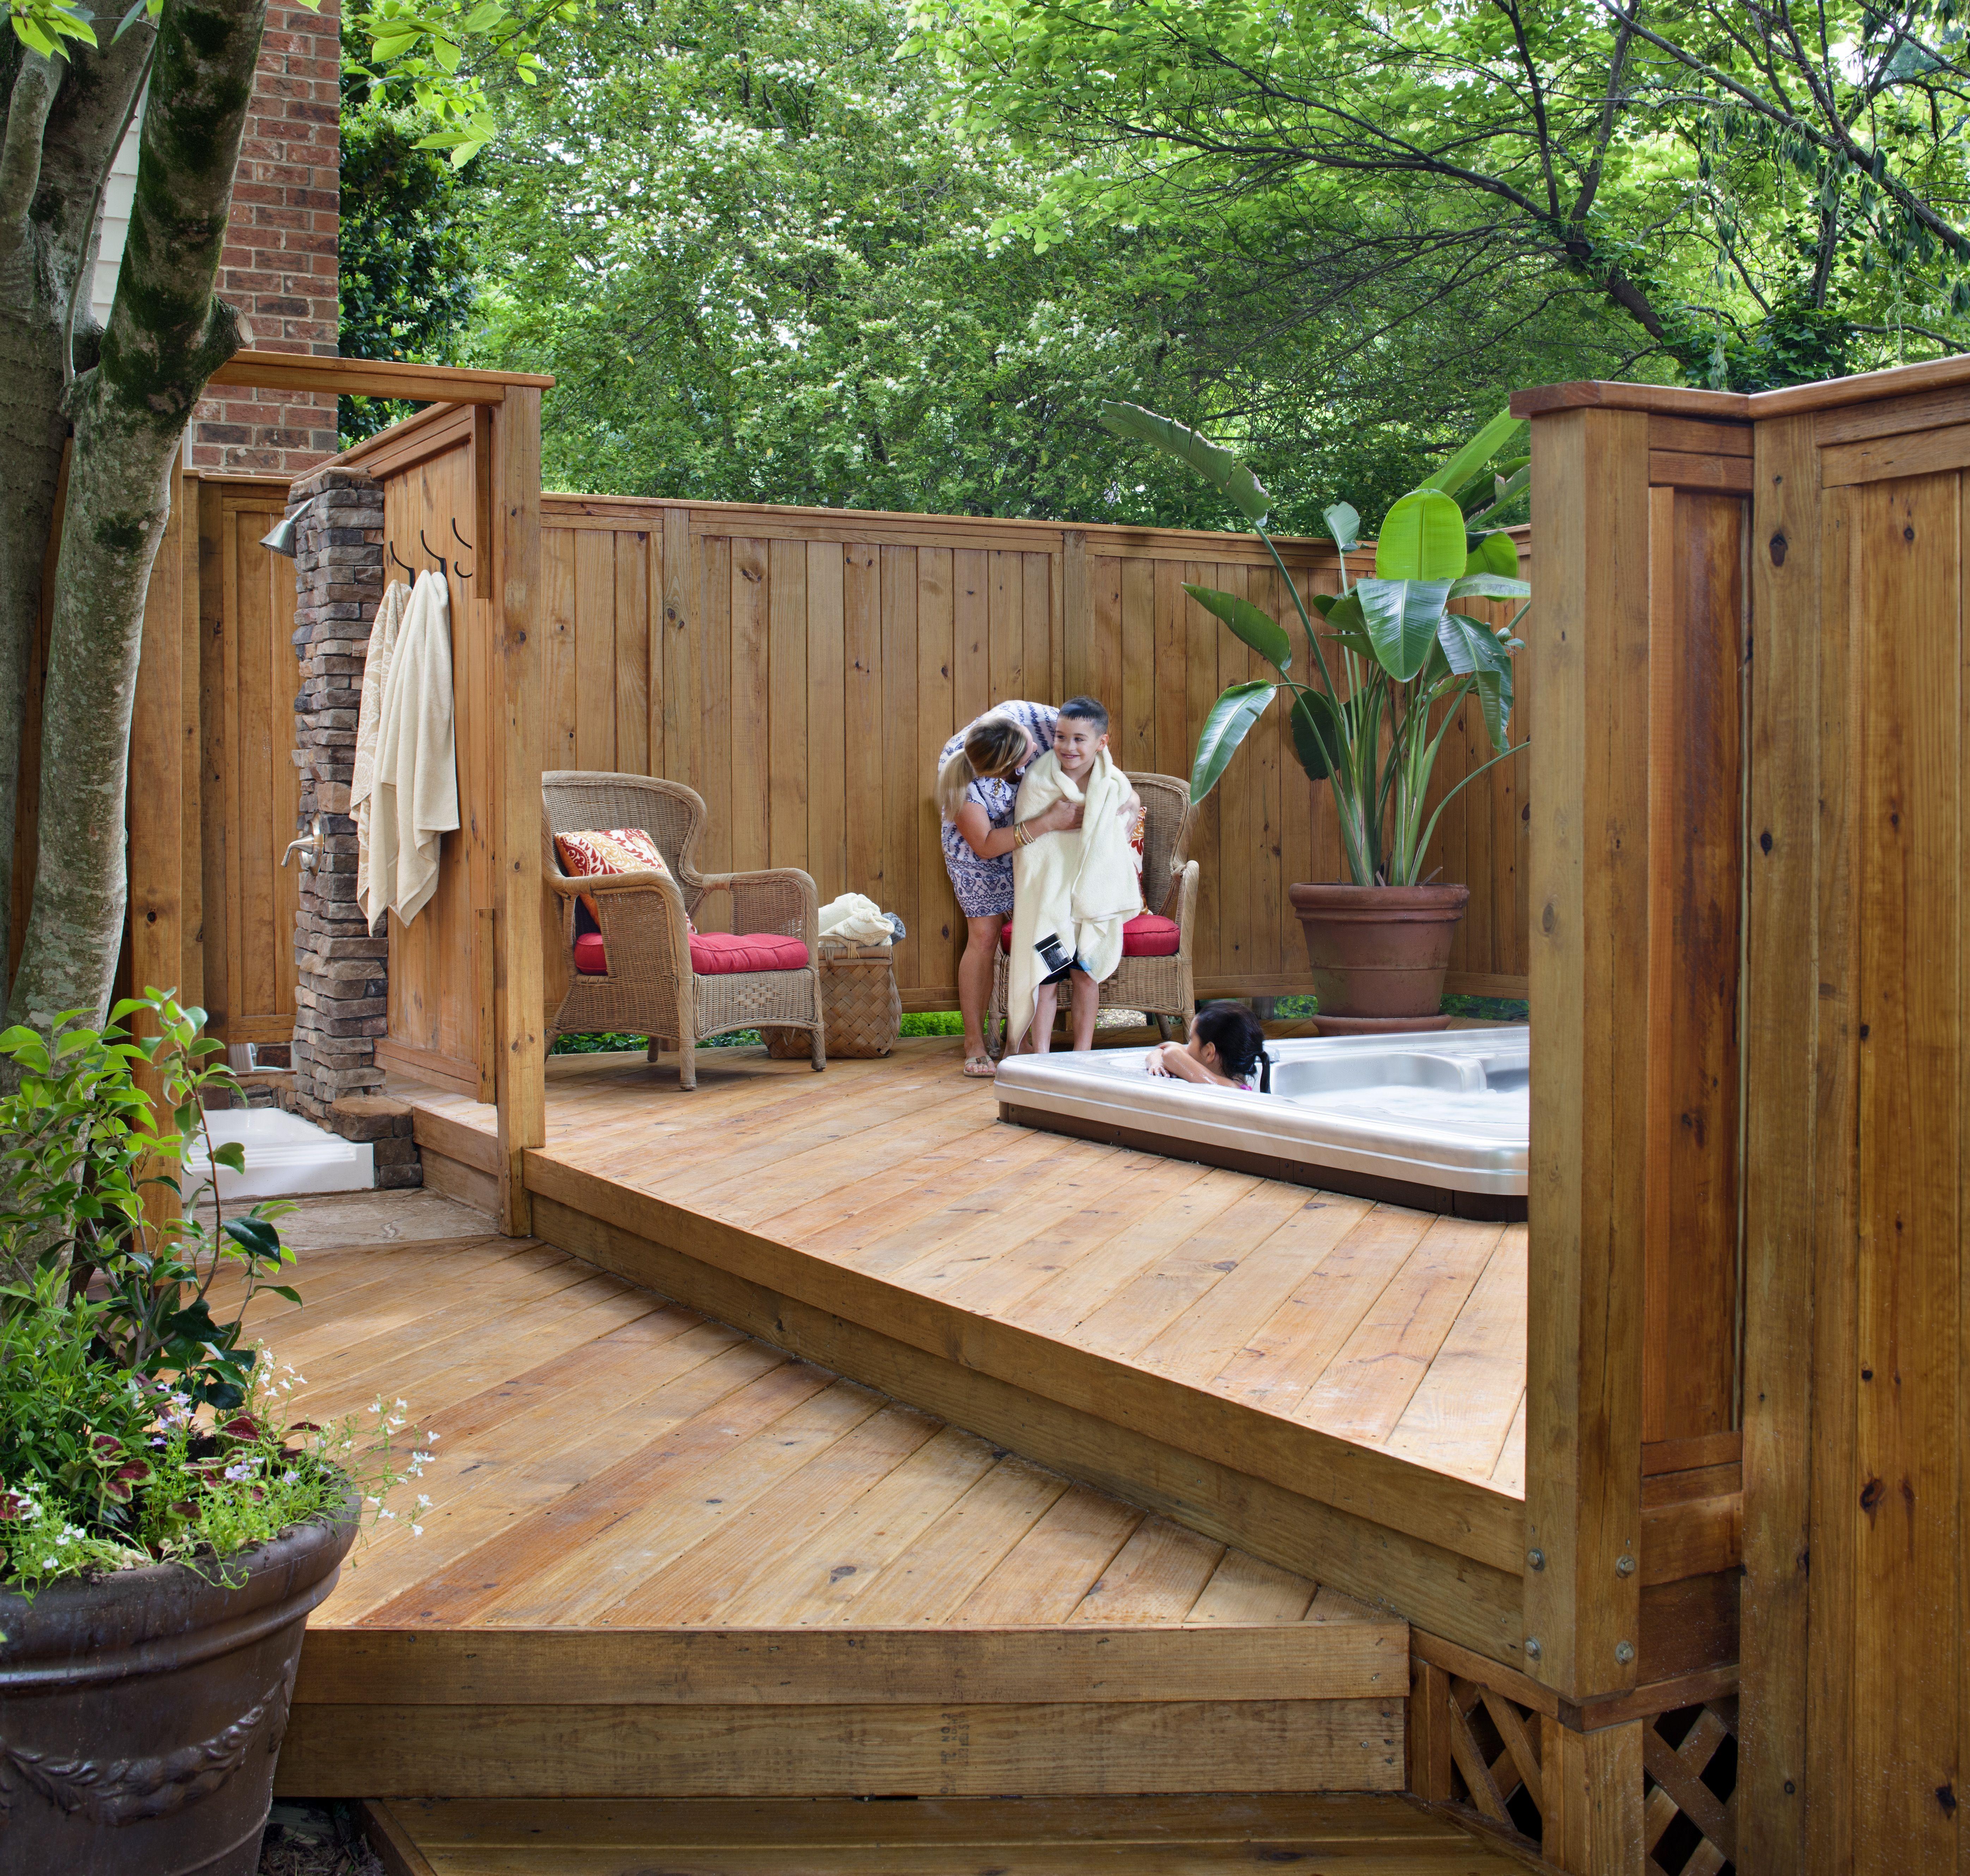 Furniture Landscaping Fencing Walnut Wood Outdoor Living